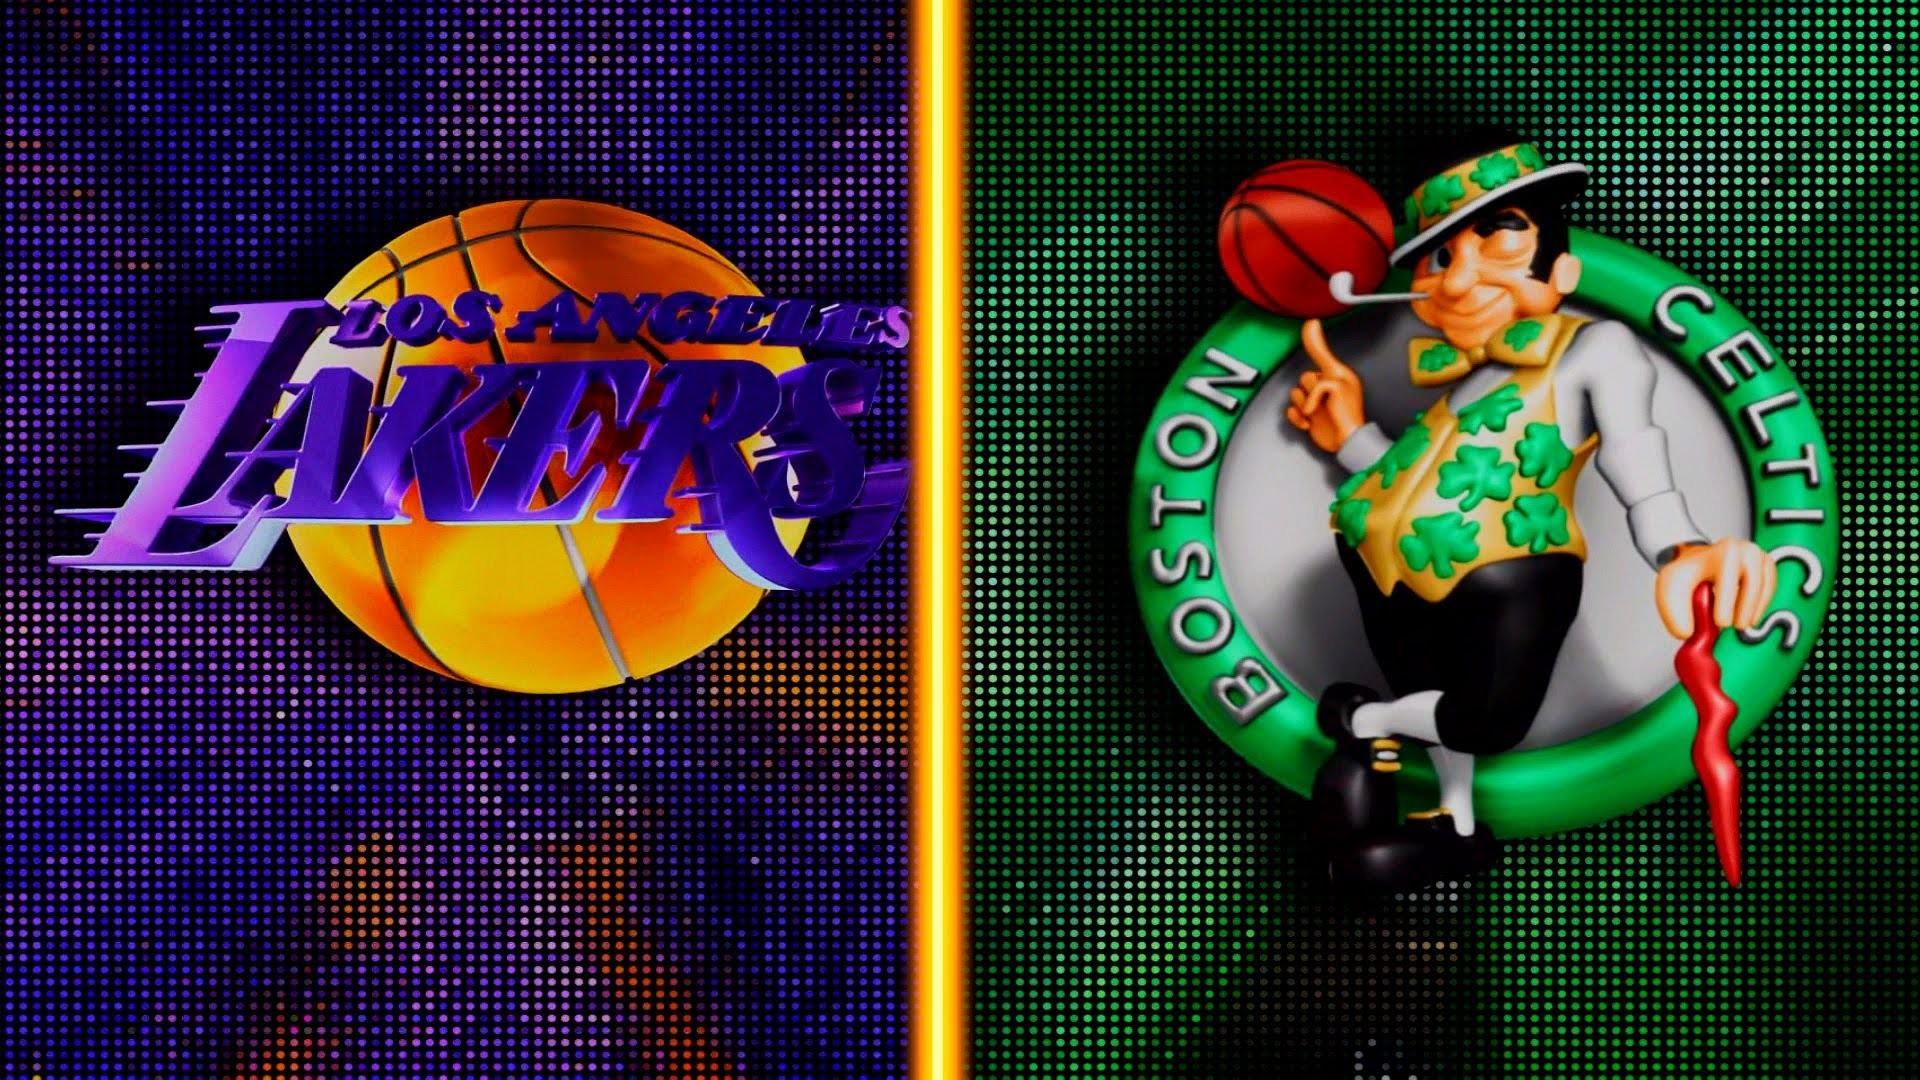 Boston Celtics [1080p 60 FPS] – YouTube